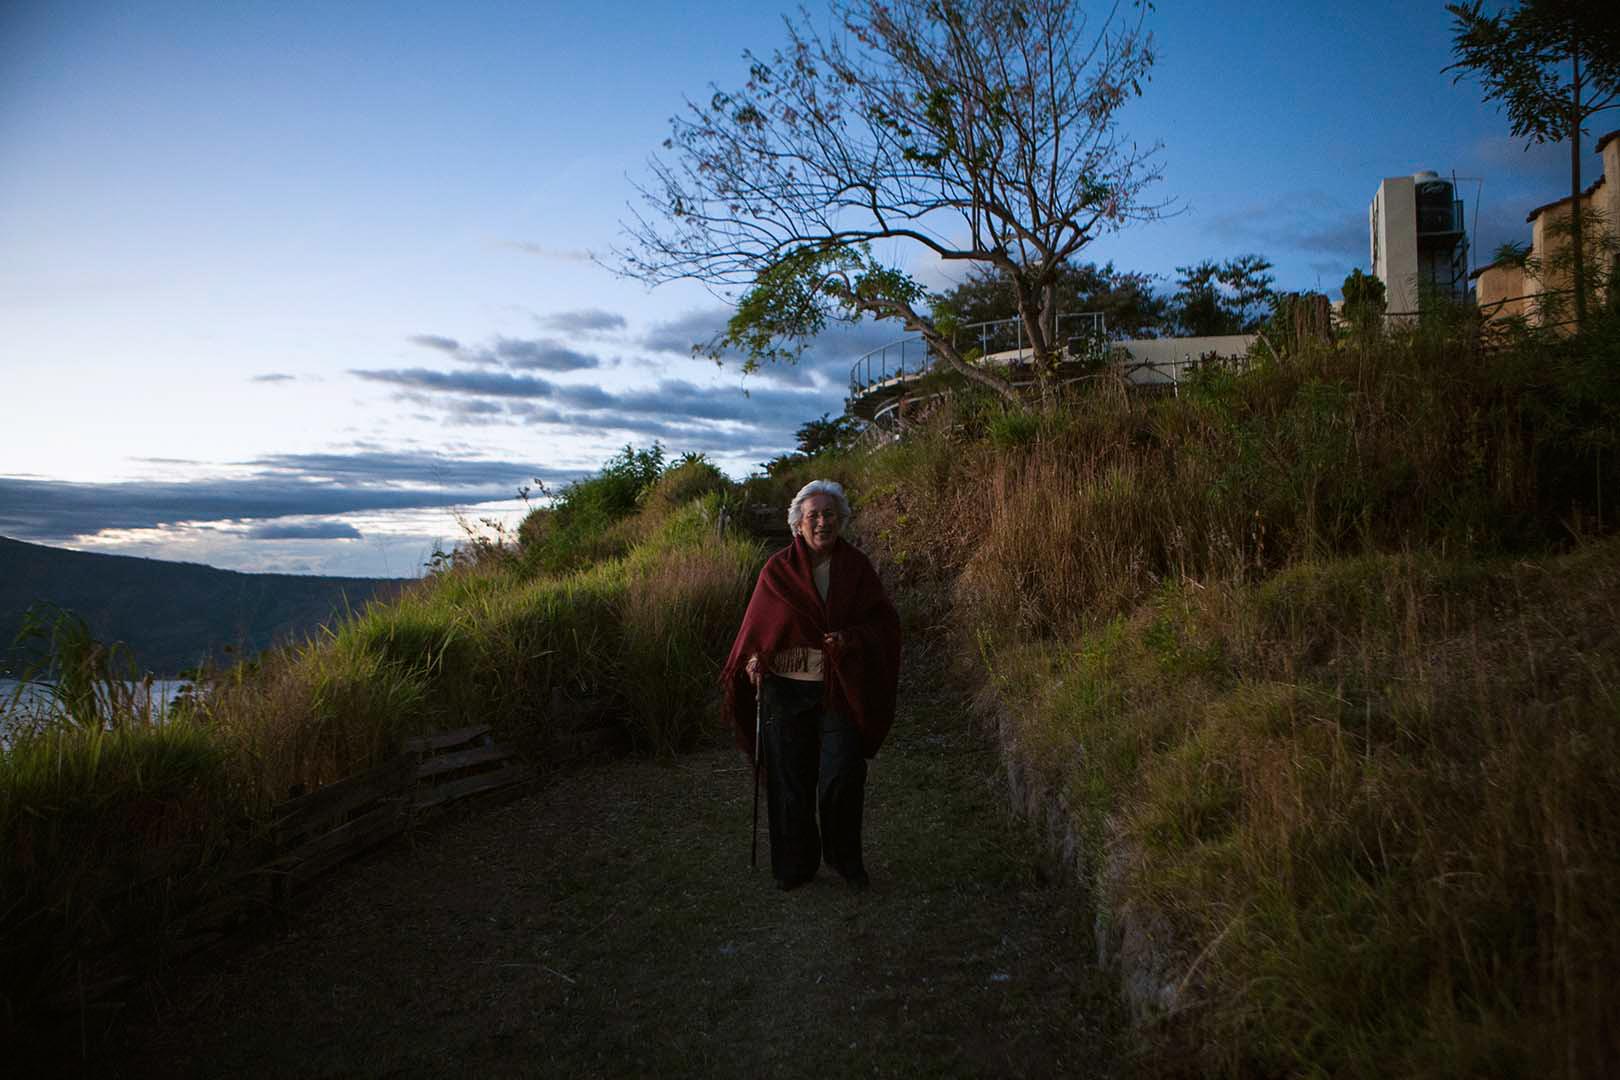 Janine in 2007 at home near lake Coatepeque in El Salvador. (Photo: Susan Sterner.)